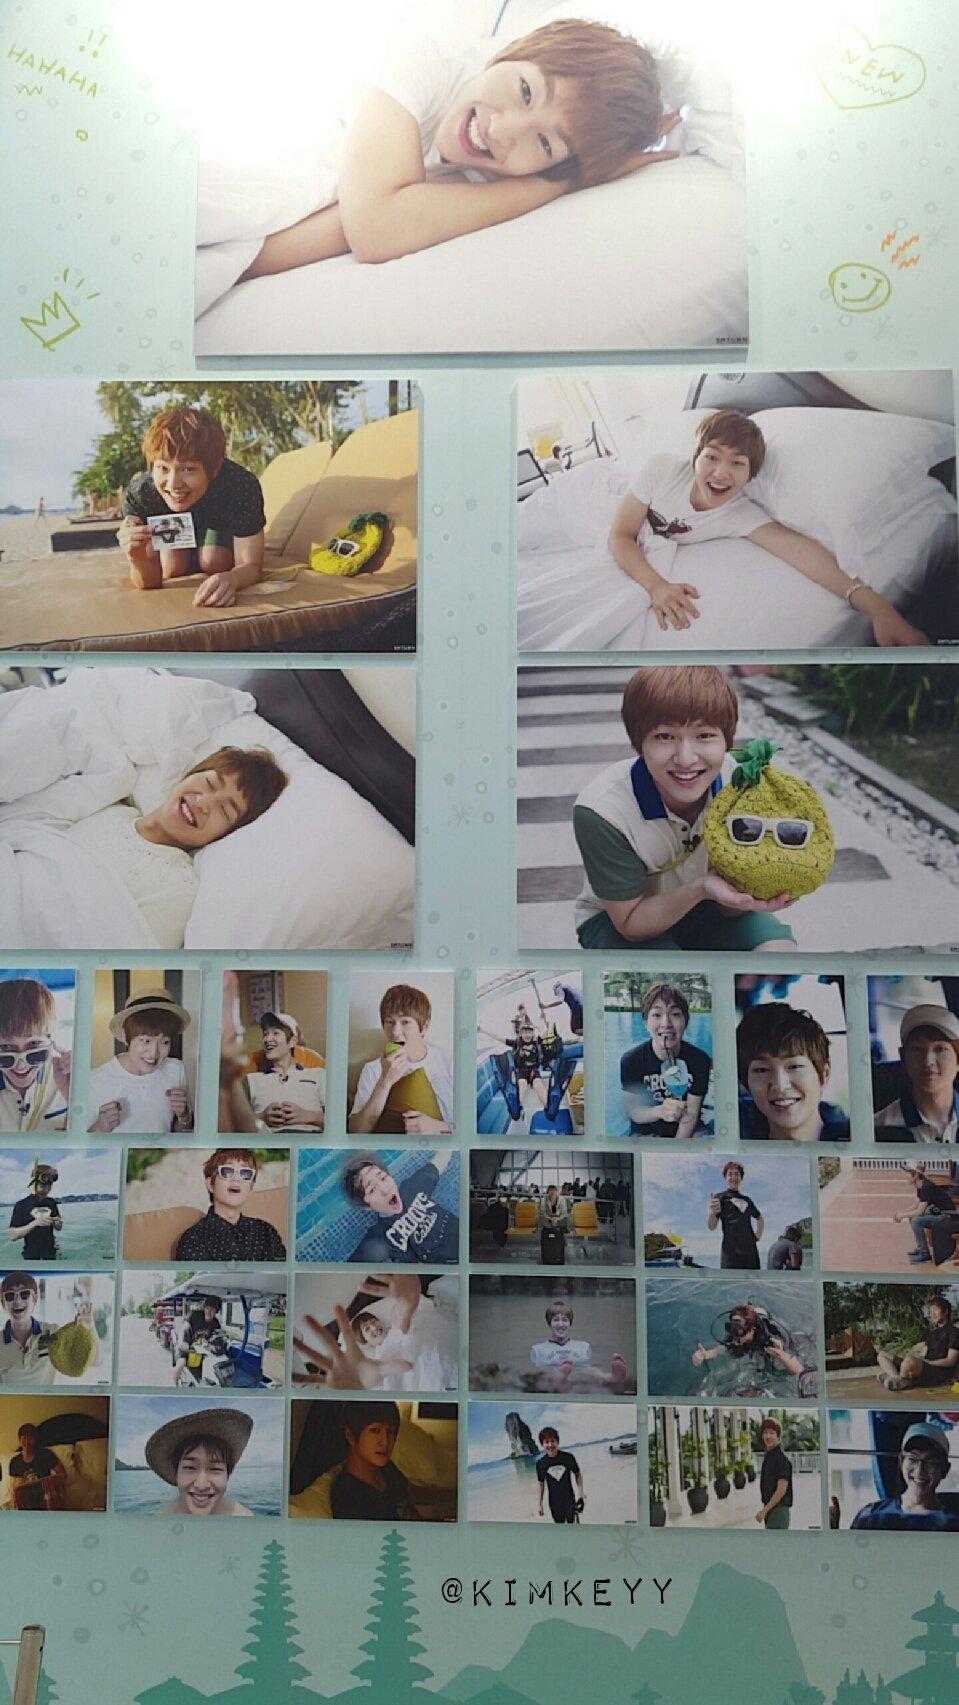 SHINee @ SHINee Surprise Vacation Exhibition 24943225709_525a4fd186_o